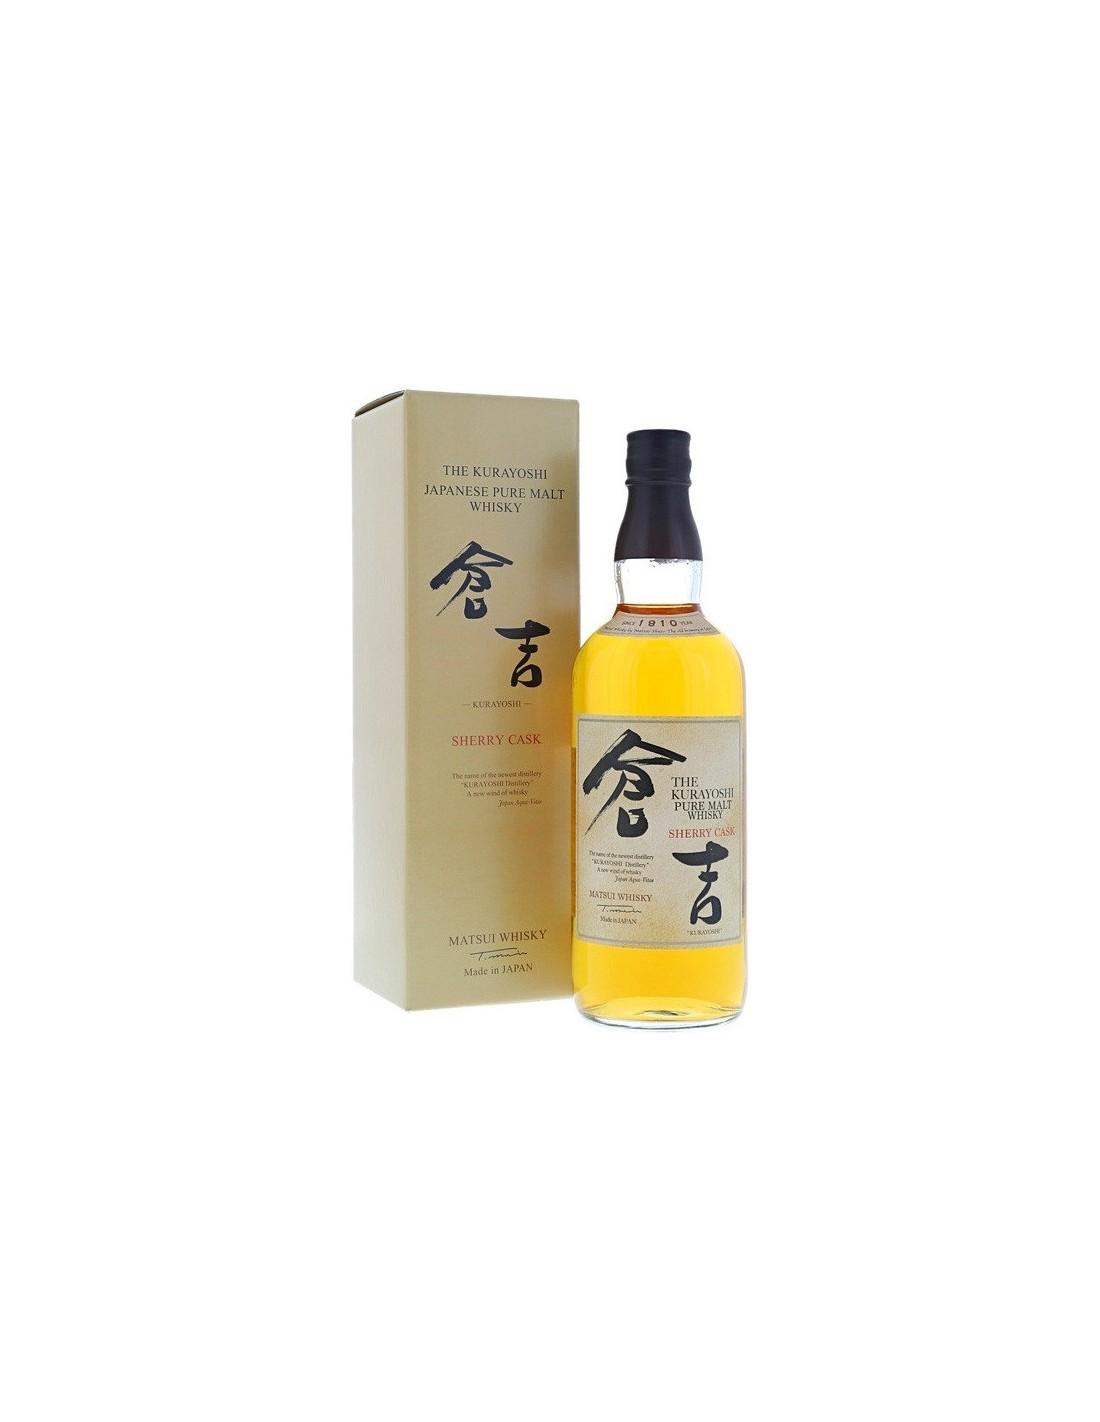 Whisky Matsui Kurayoshi Sherry Cask, 43% alc., 0.7L, Japonia